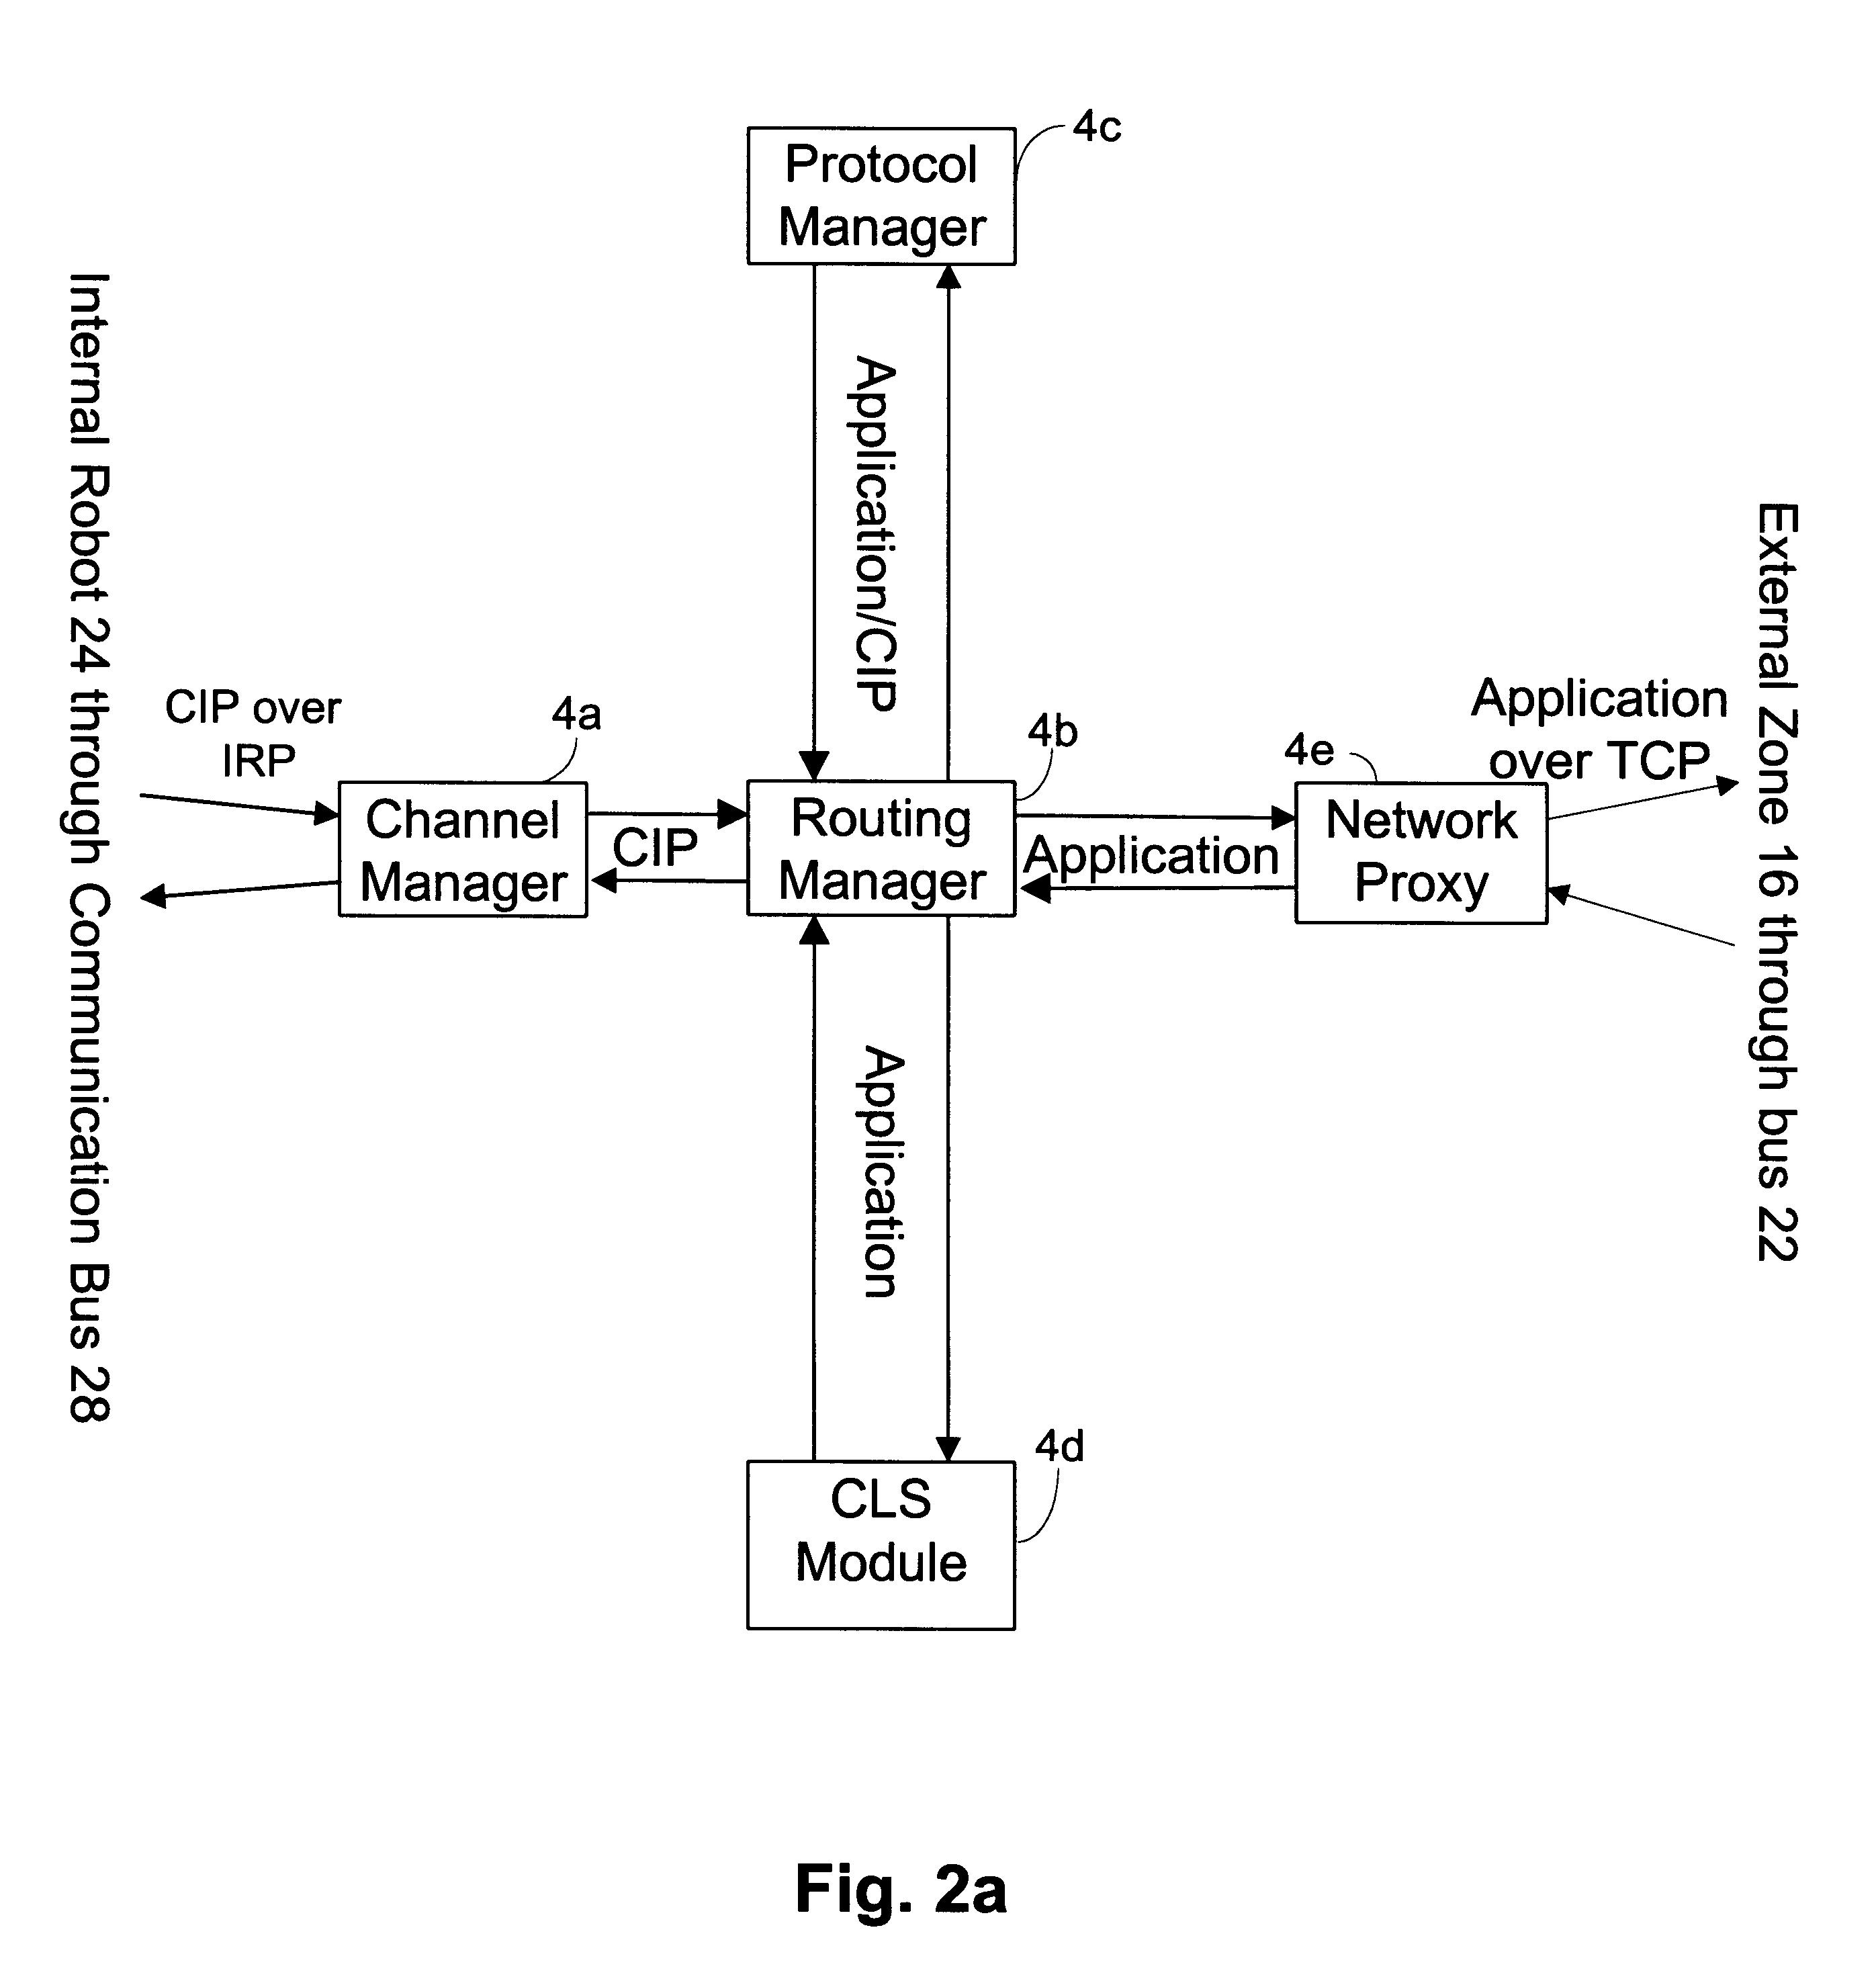 Patent US 6,321,337 B1